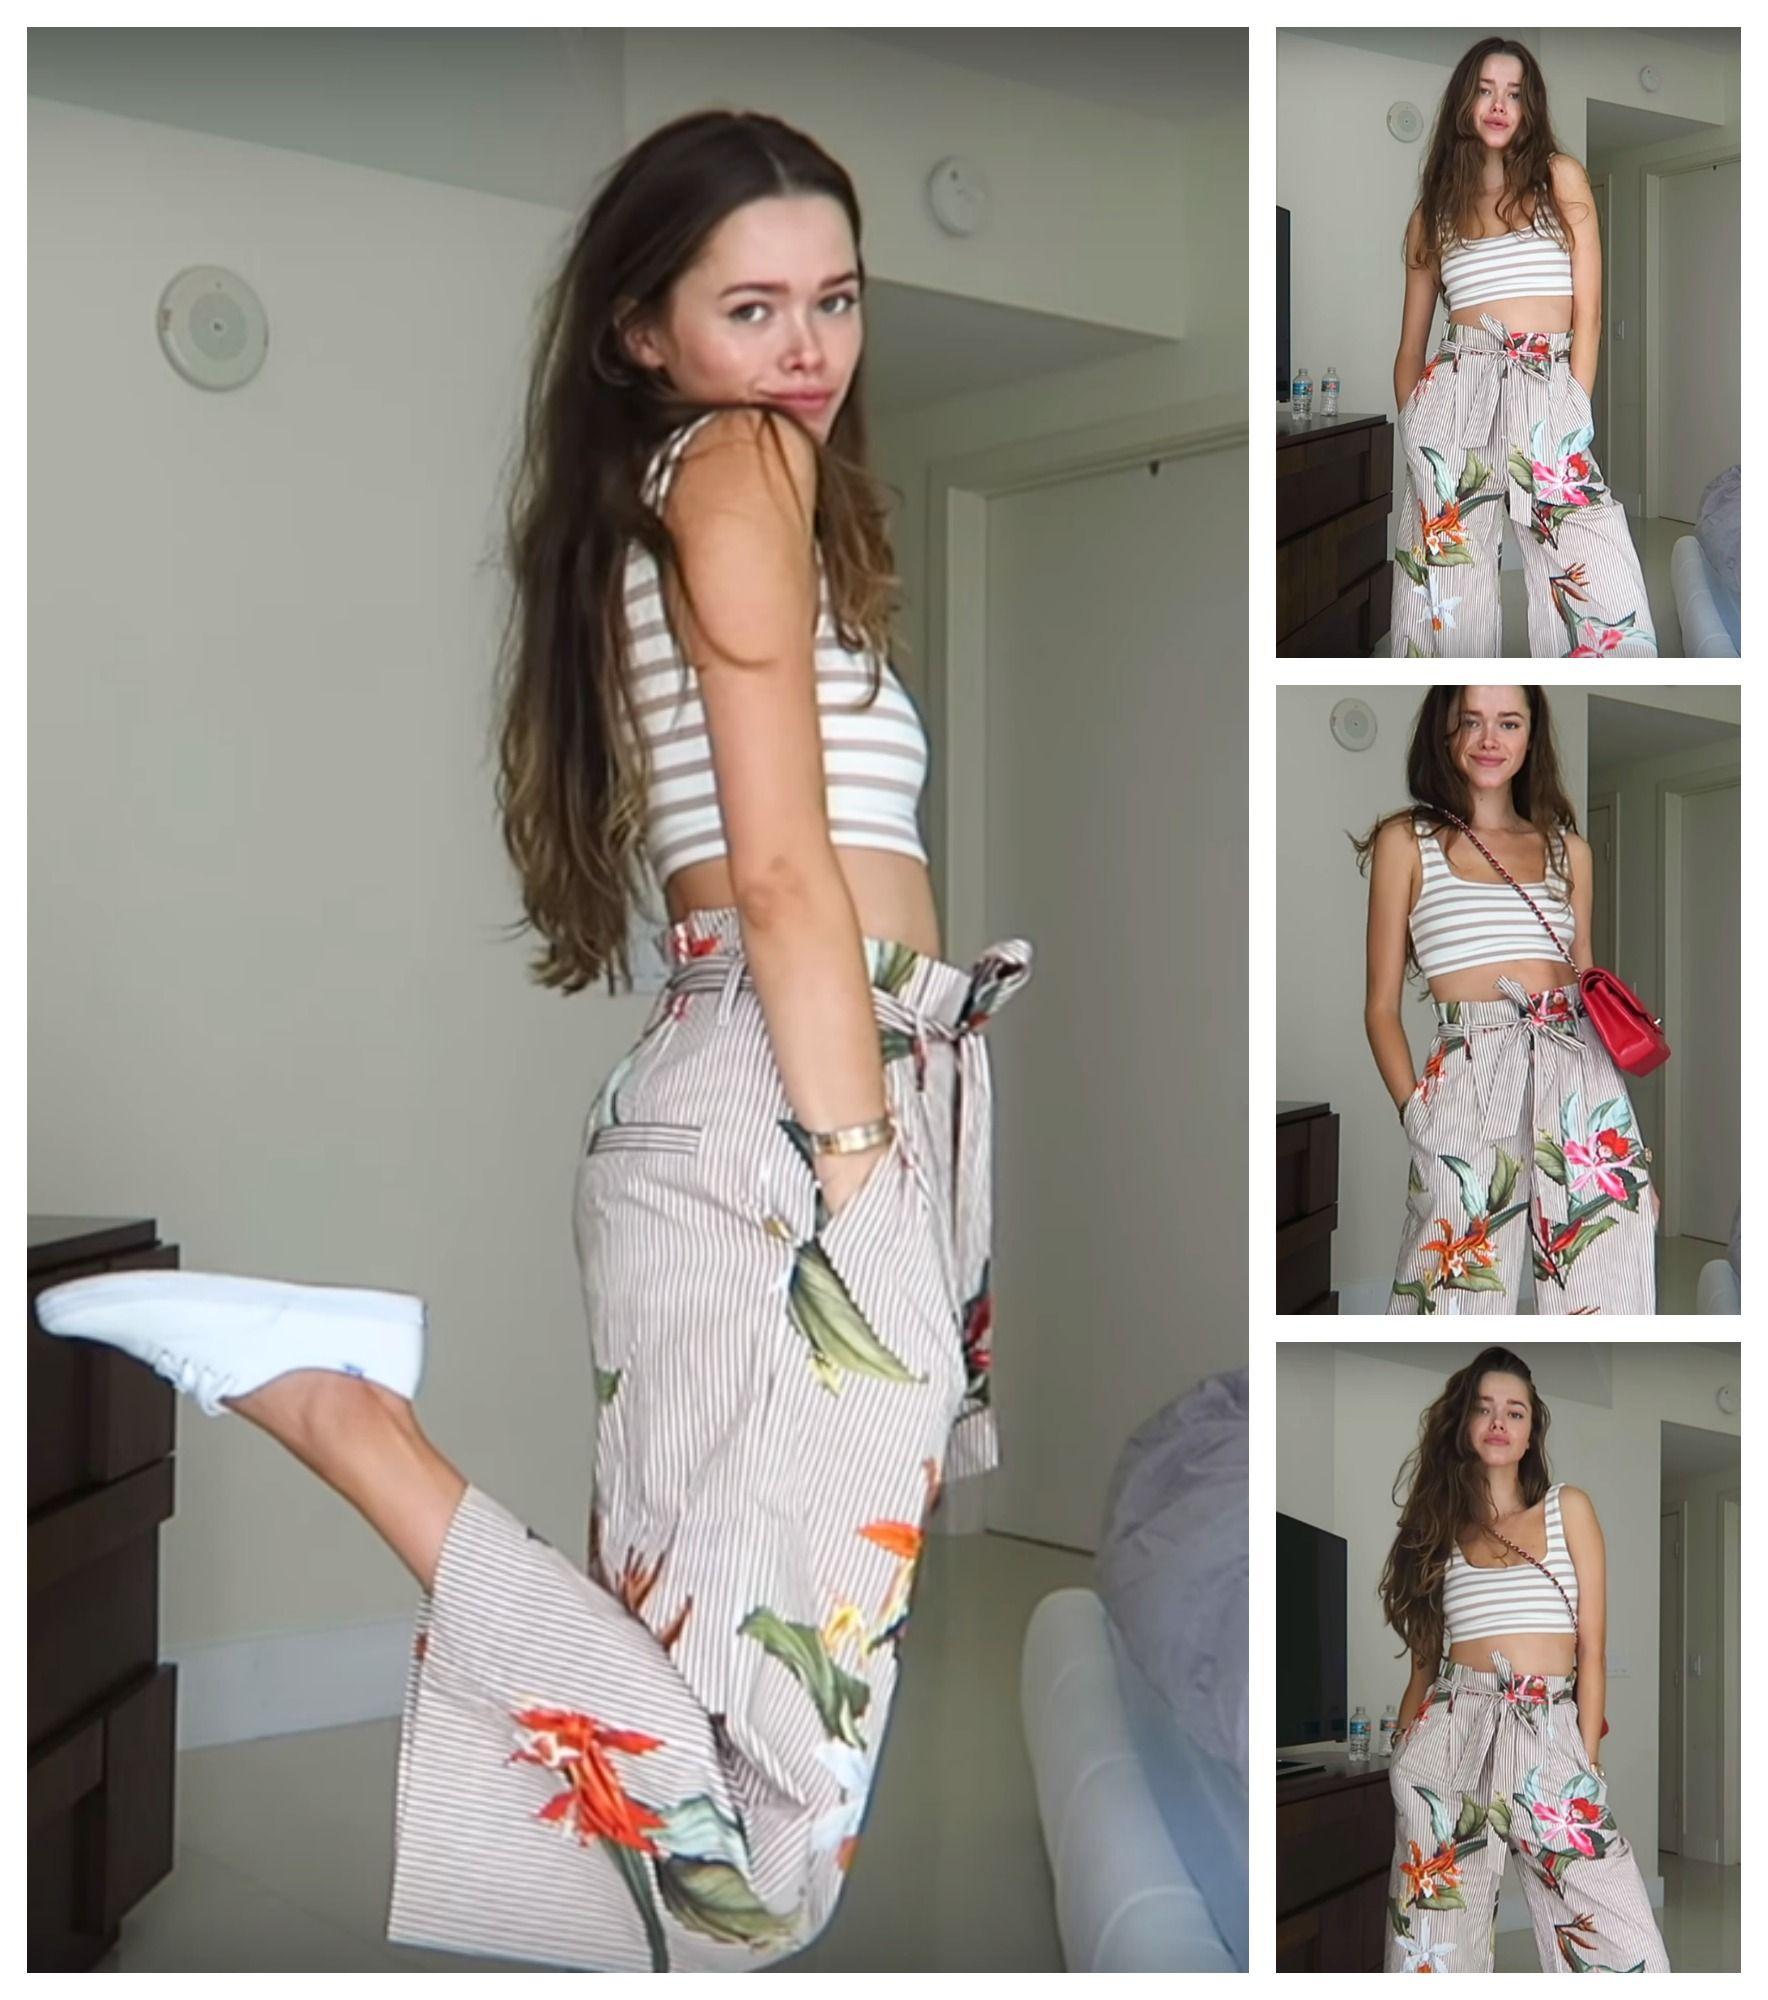 b93f89a1413 valeria lipovetsky lookbook  youtube  fashion  model